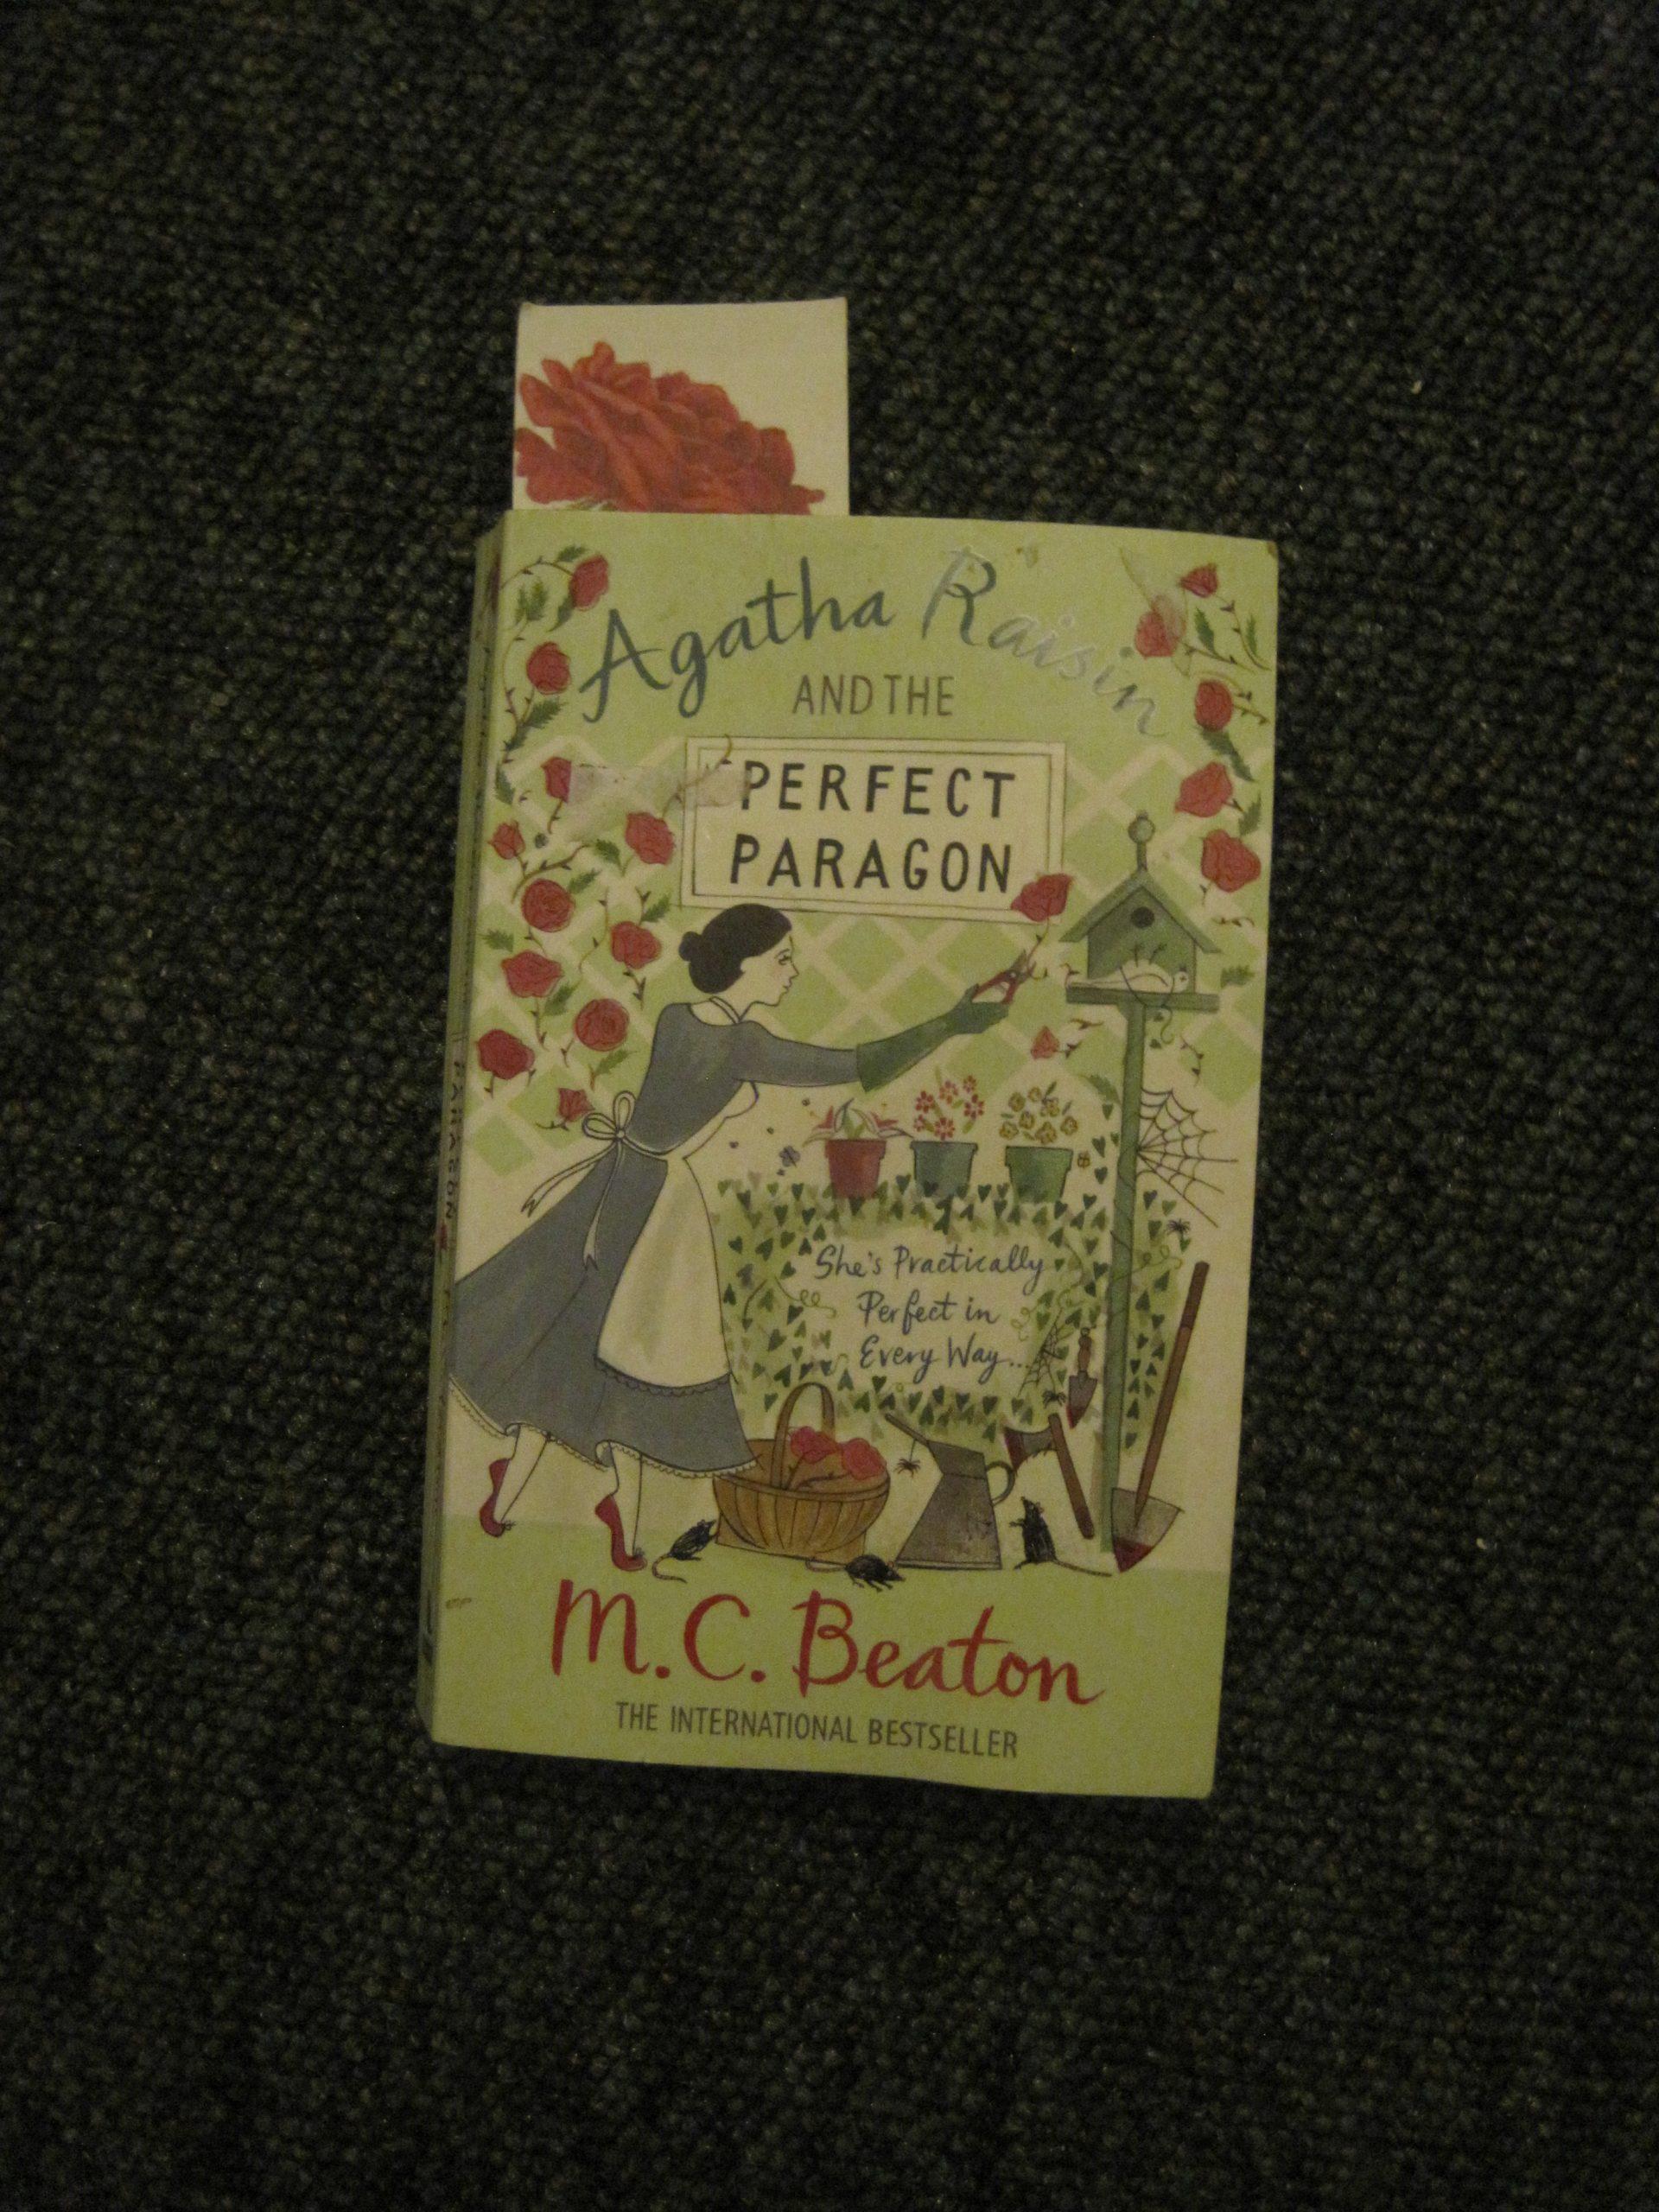 Agatha Raisin and the Perfect Paragon - photo by Juliamaud